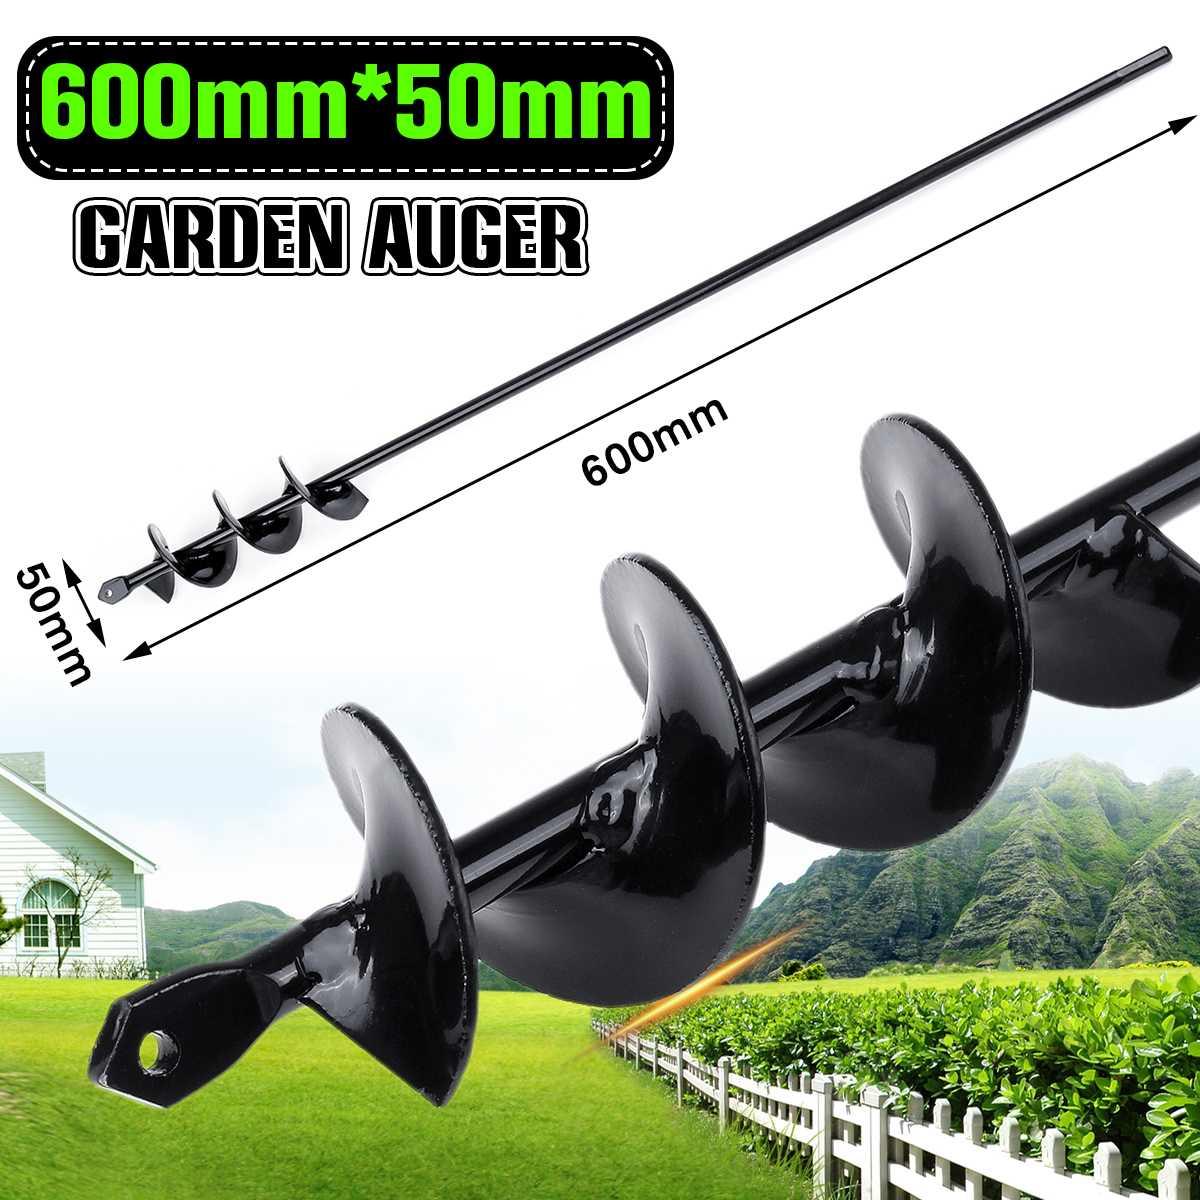 Drill-Bit Garden-Auger-Tool Digger Post-Hole Digger-600x50mm-Tool 1pcs Planting-Machine